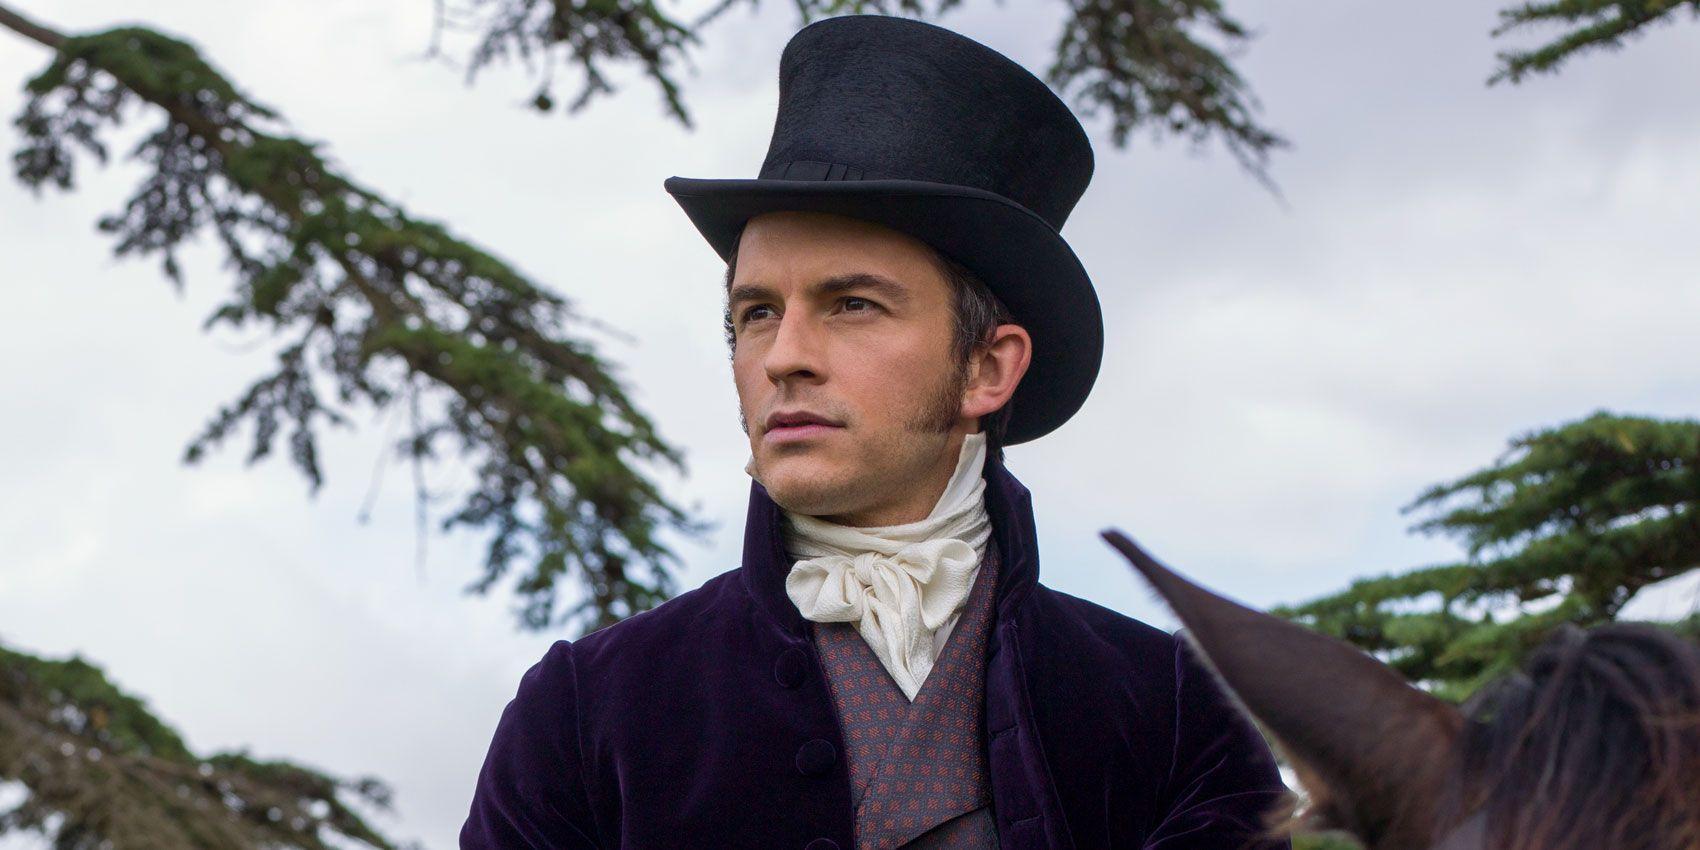 'Bridgerton' Season 2 Resumes Filming After COVID-19 Shutdown